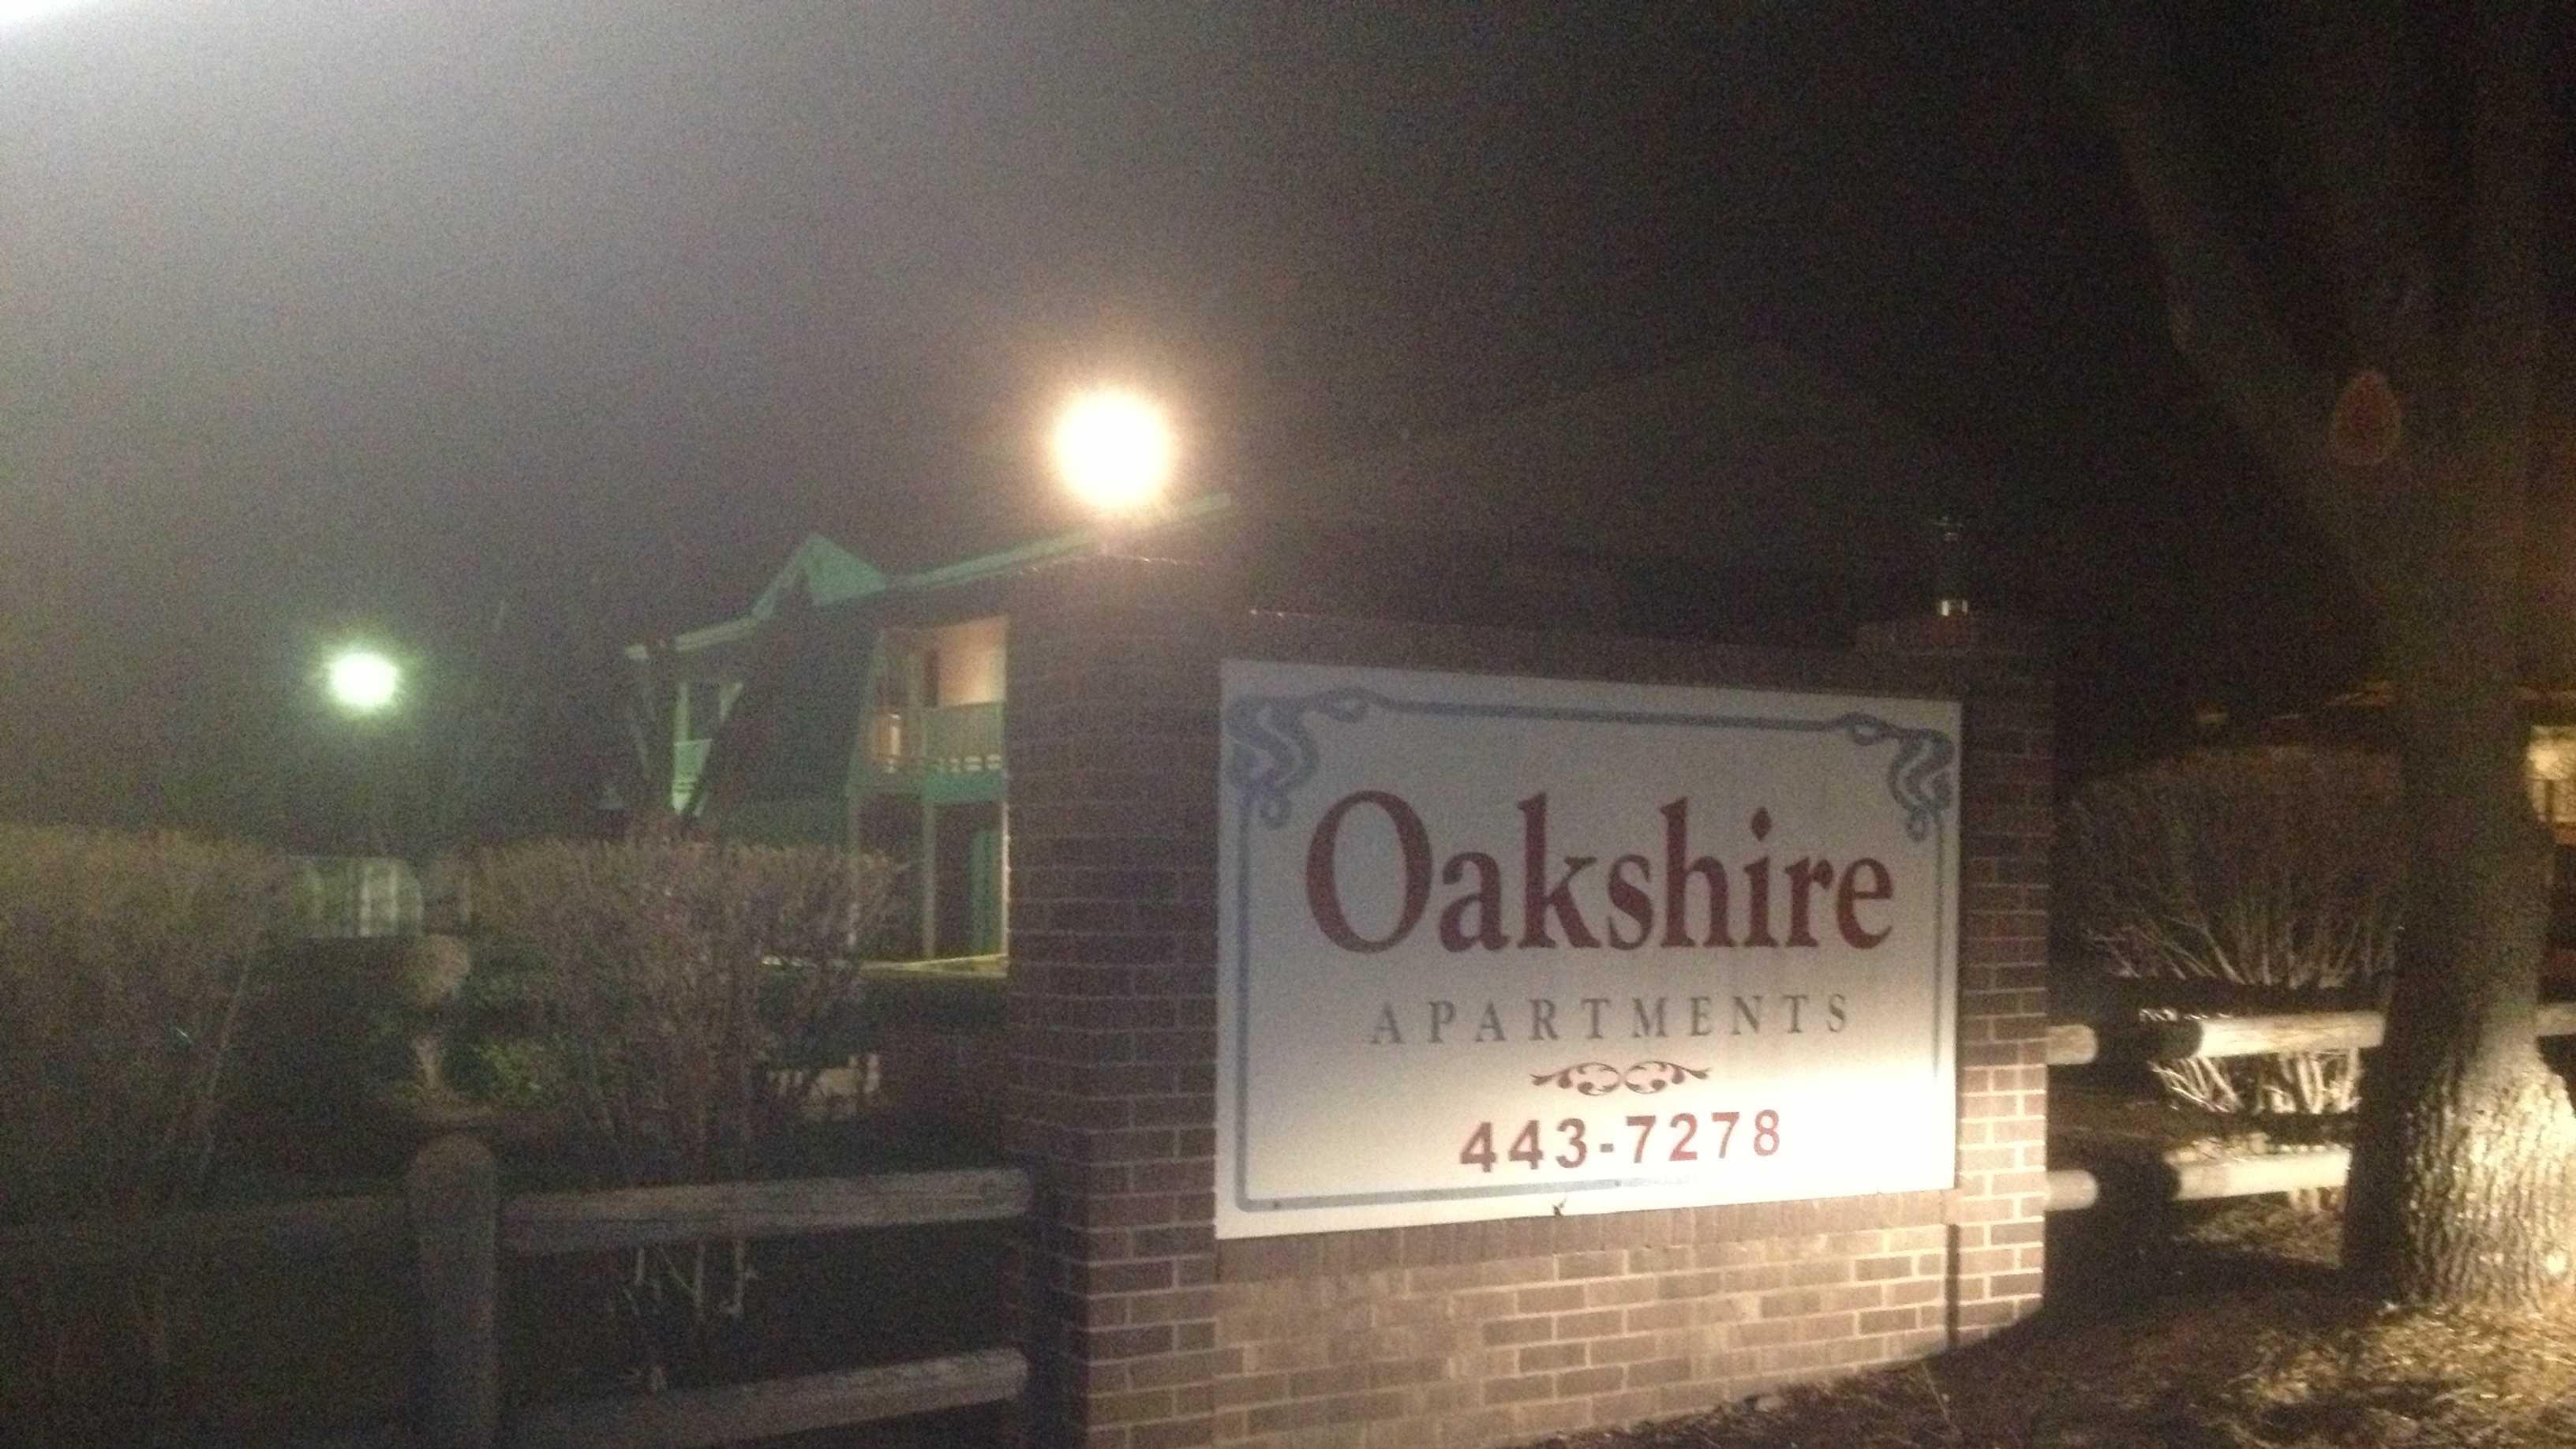 Oakshire Apartments